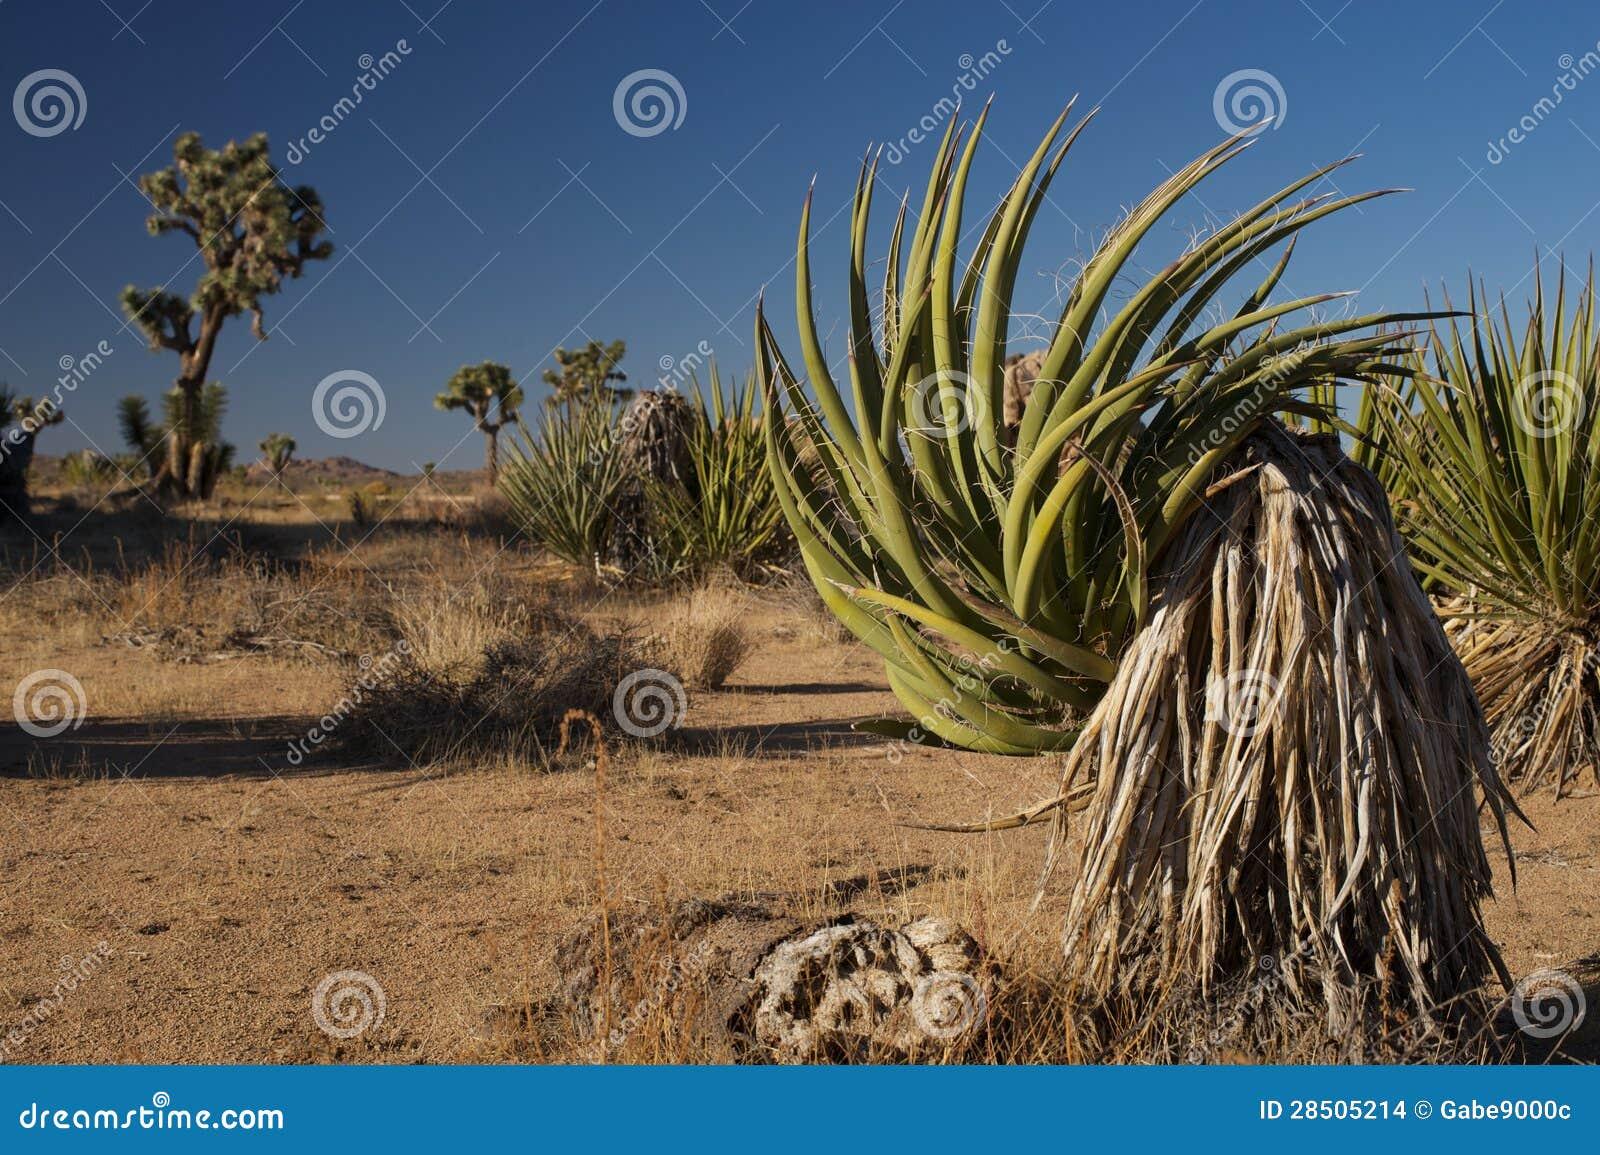 Yucca Plant at Joshua Tree